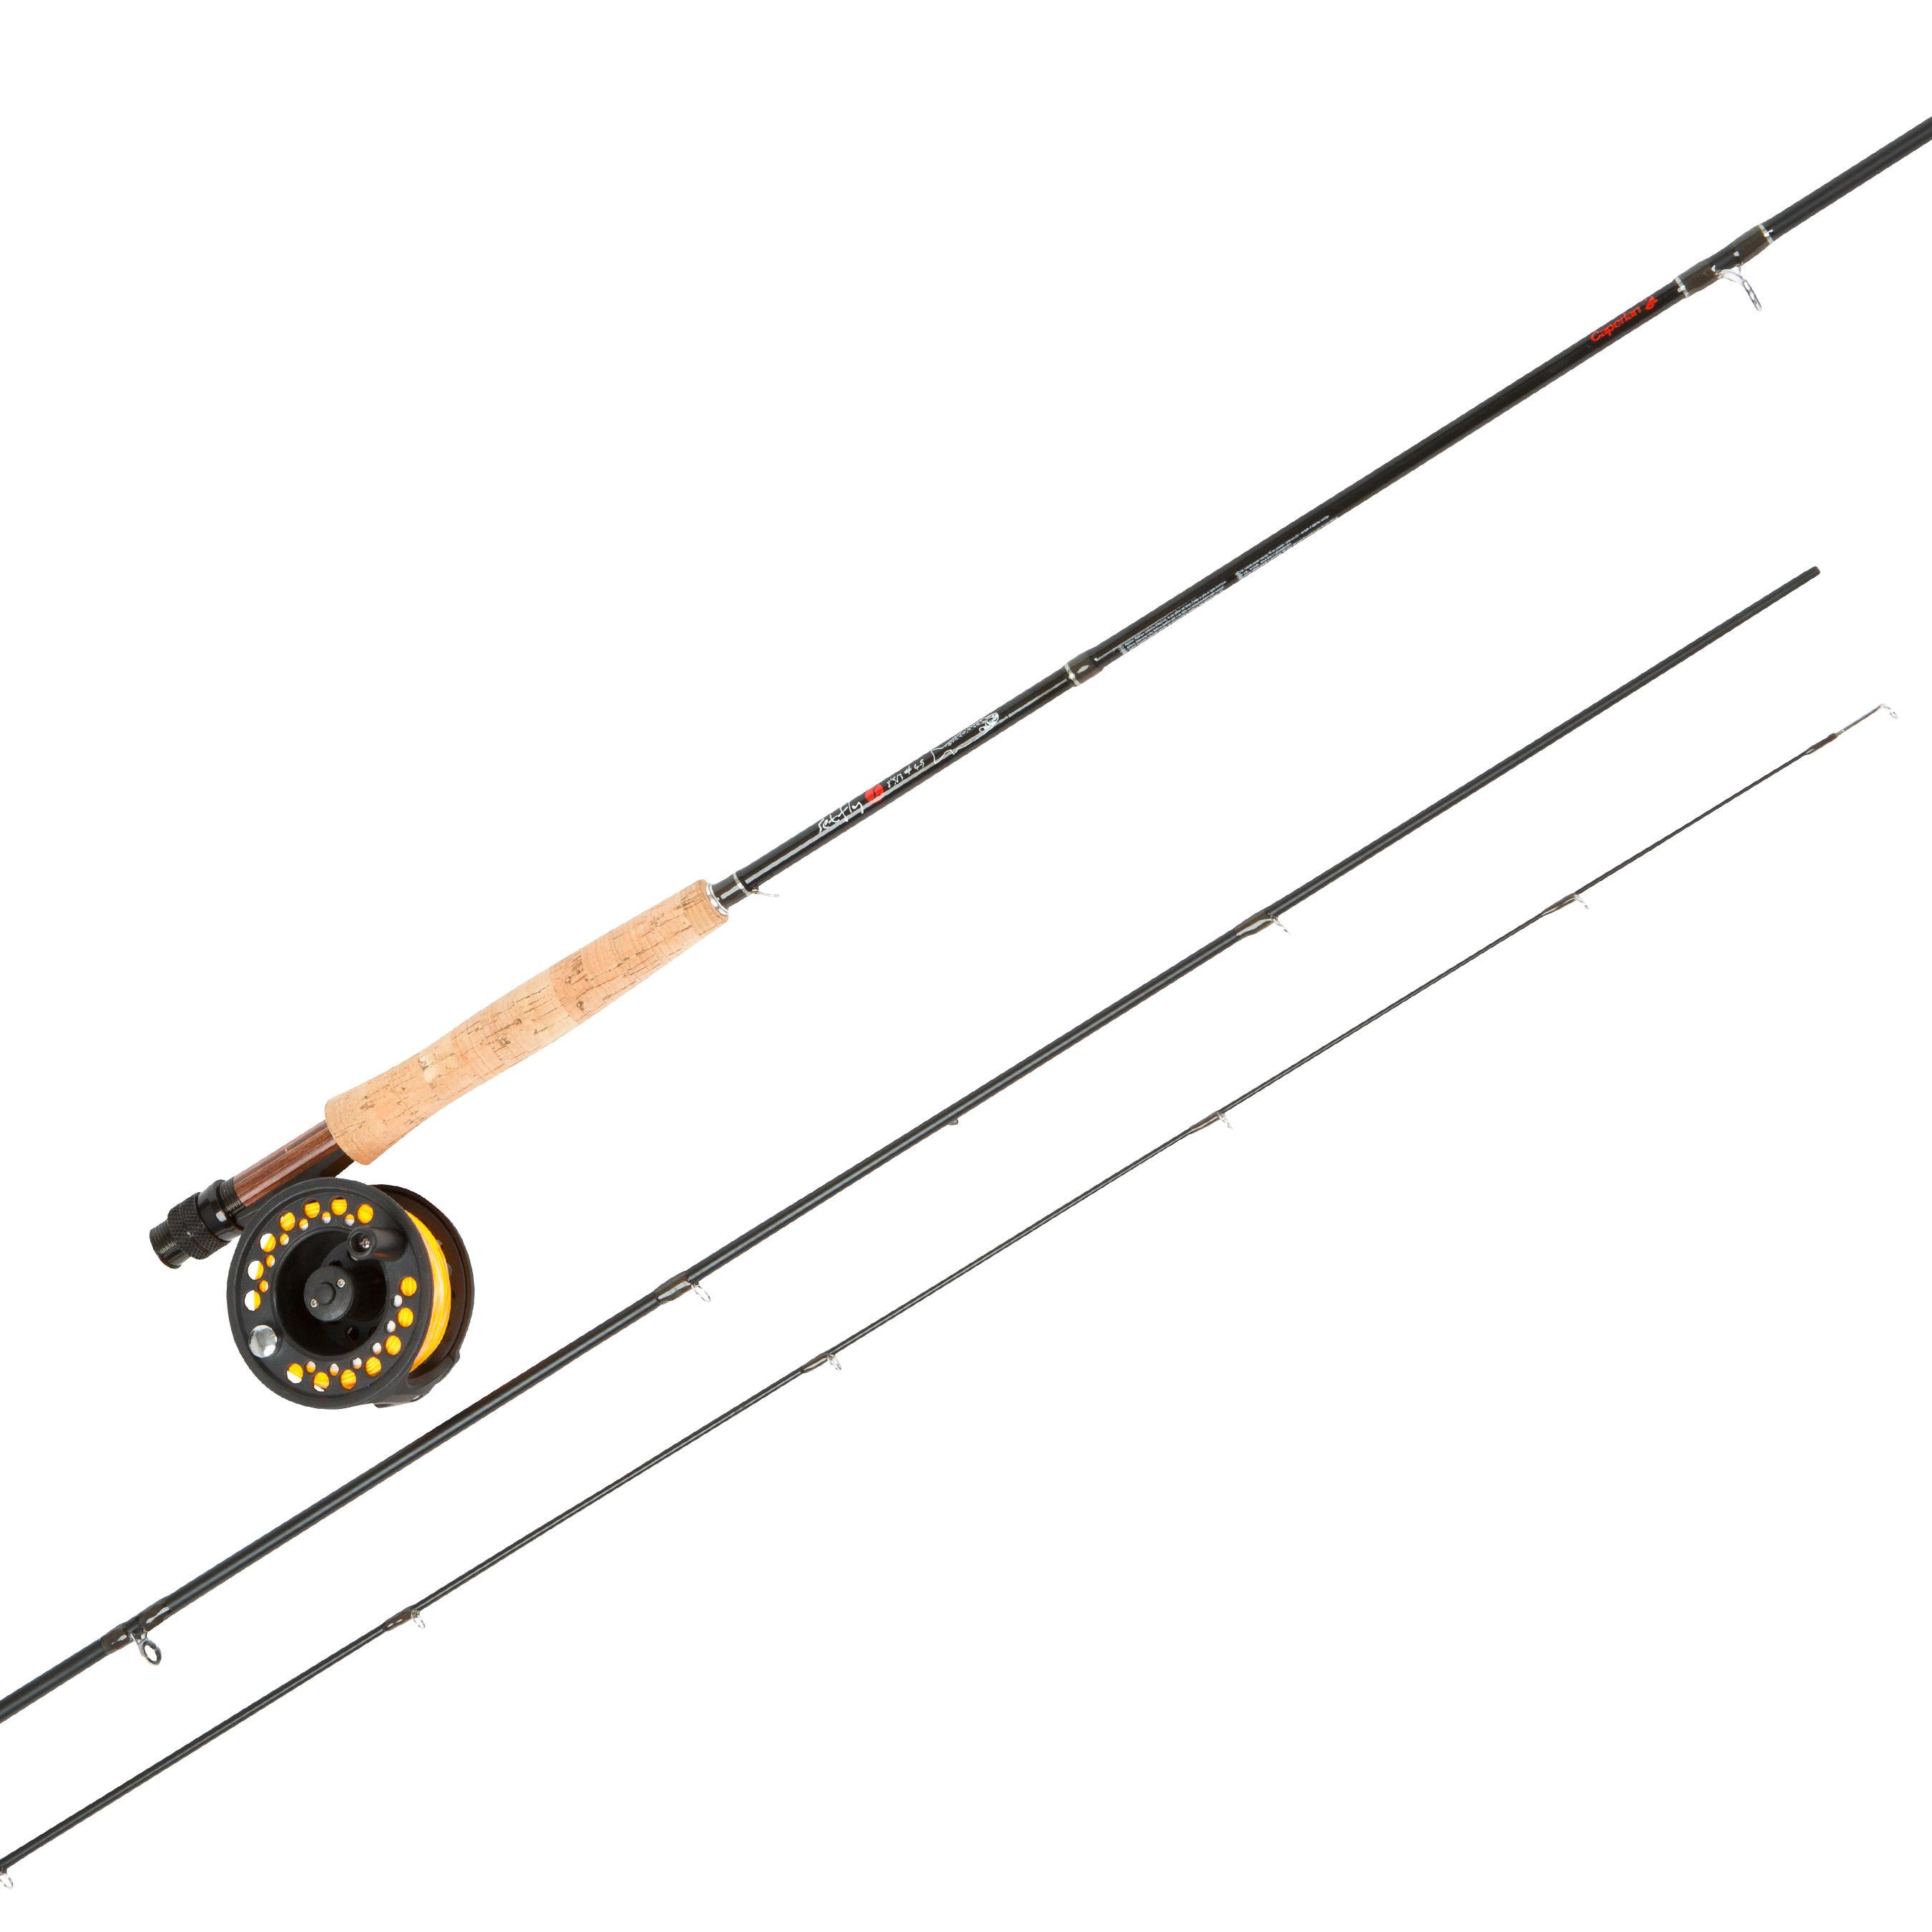 Ensemble Pêche à la mouche Go Fishing Fly